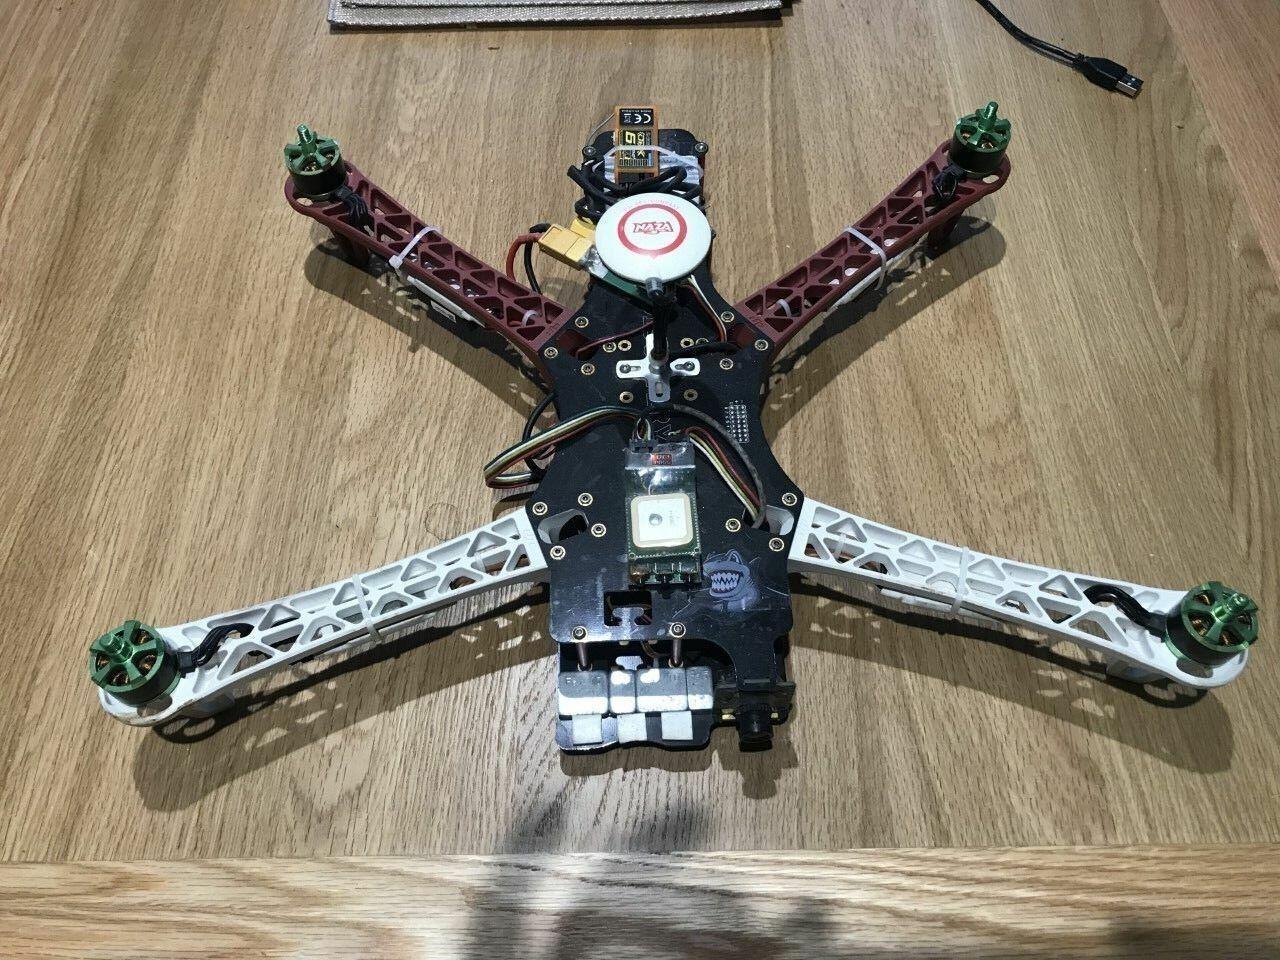 TBS Discovery RC Quadcopter DJI Naza GPS 30A ESC 920KV Motors ImmersionRC EzOSD